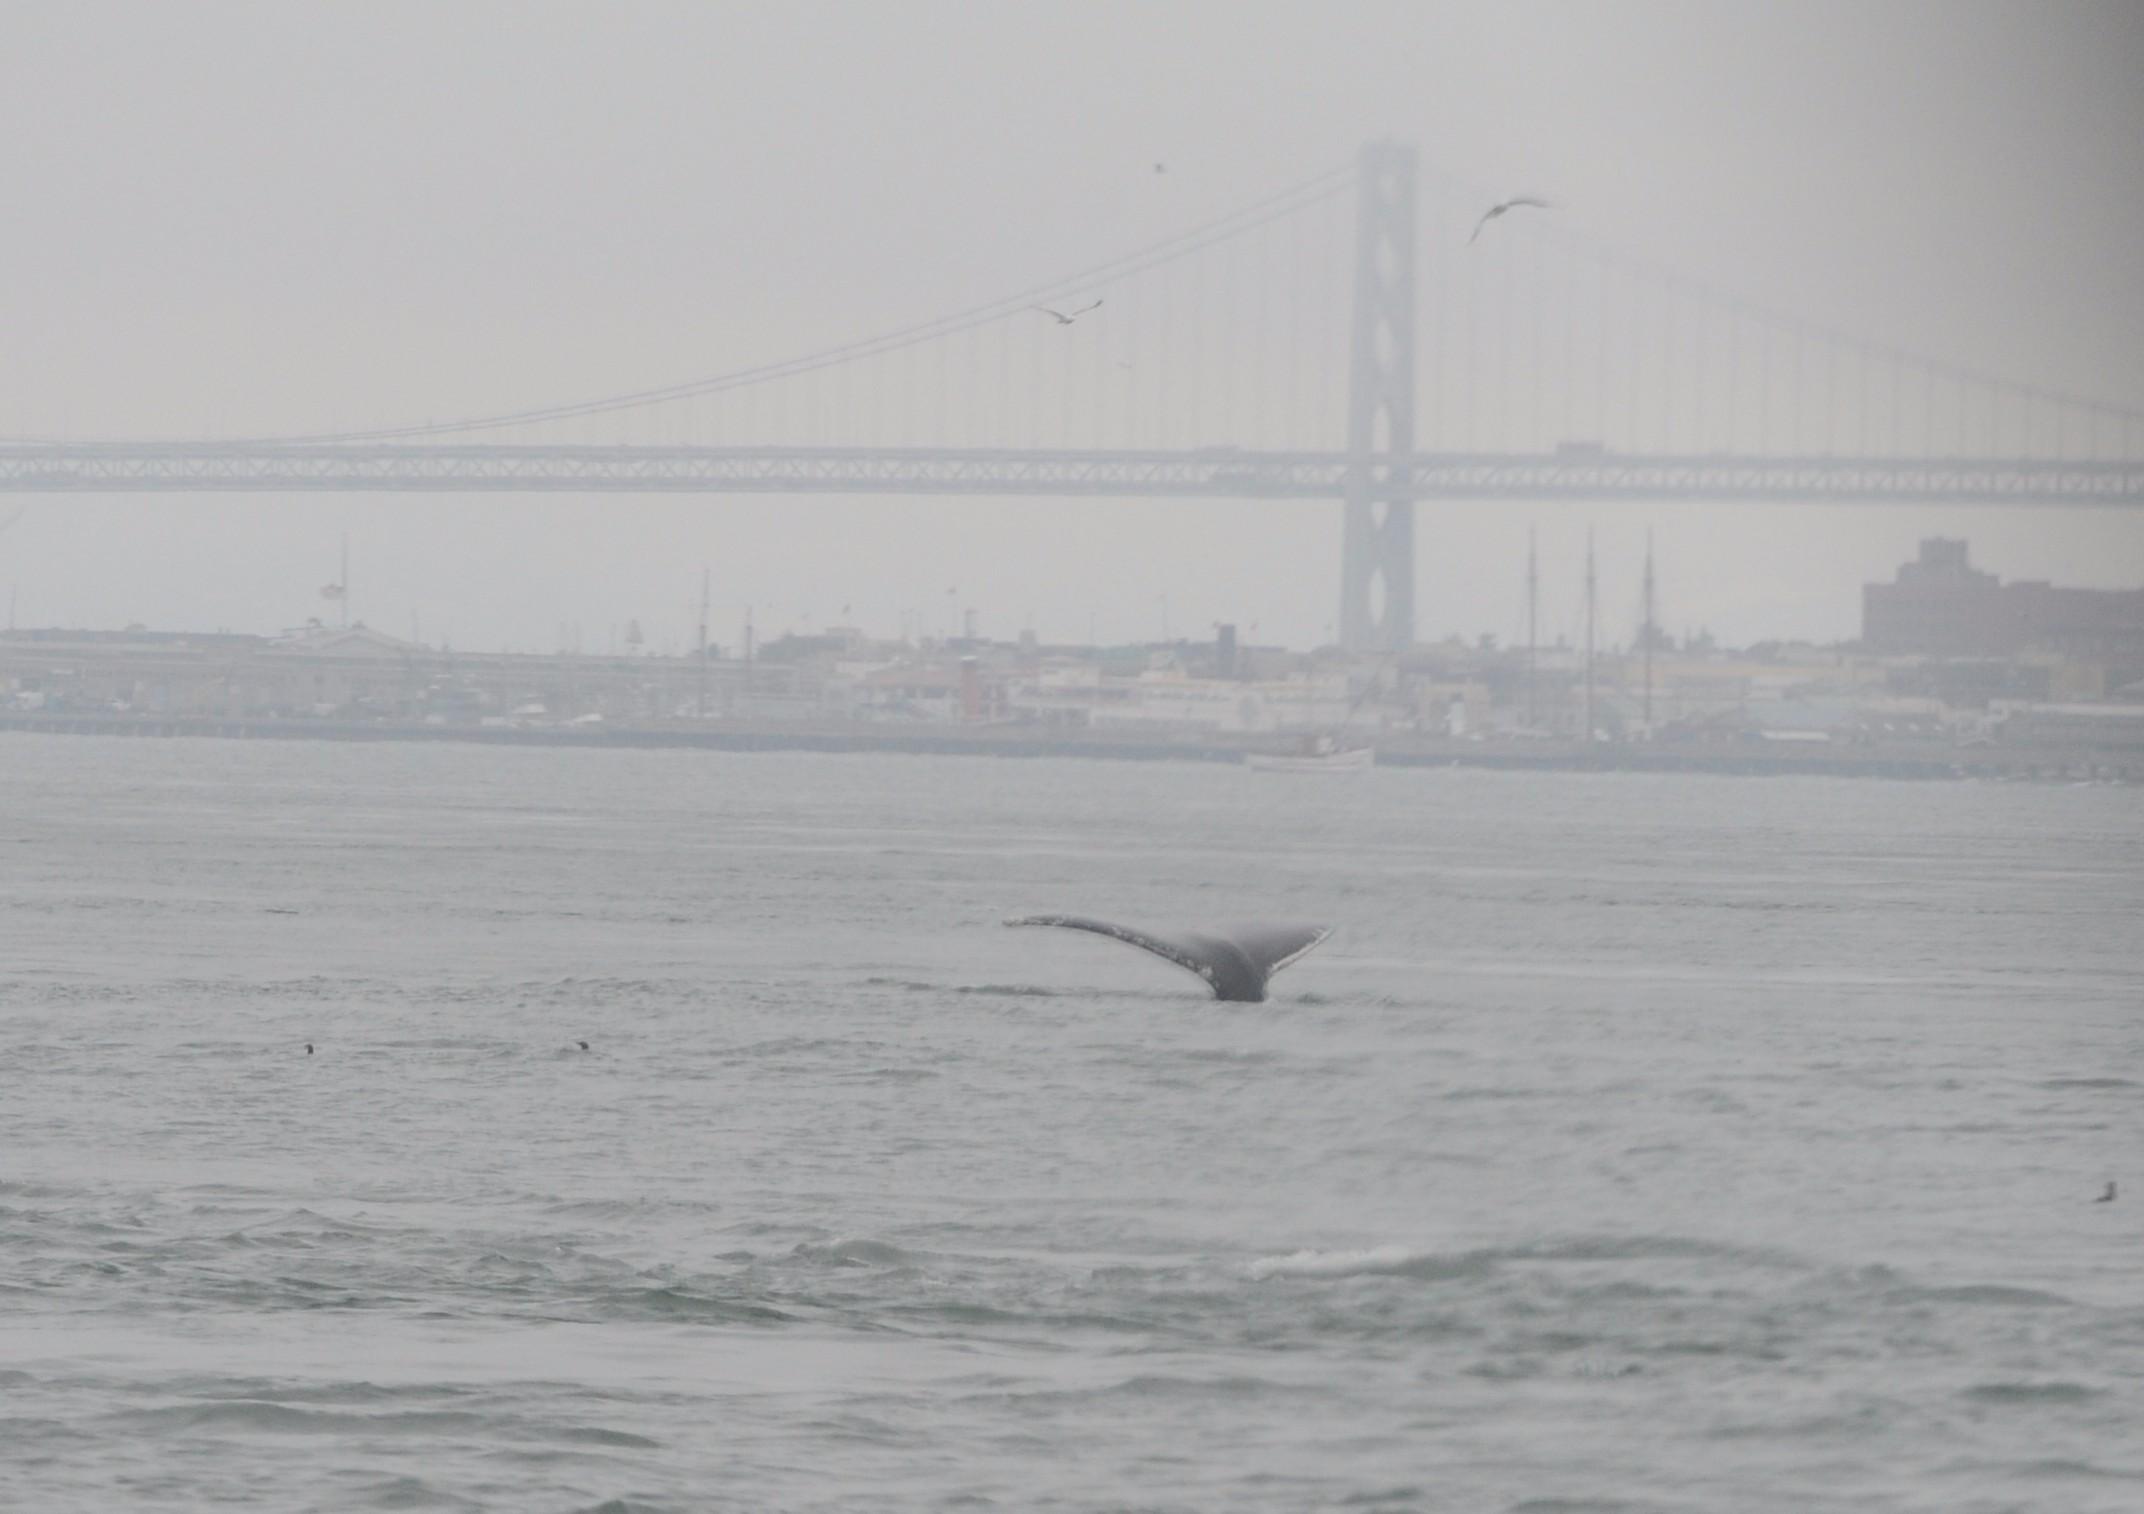 Humpback fluke with Bay Bridge in the background.